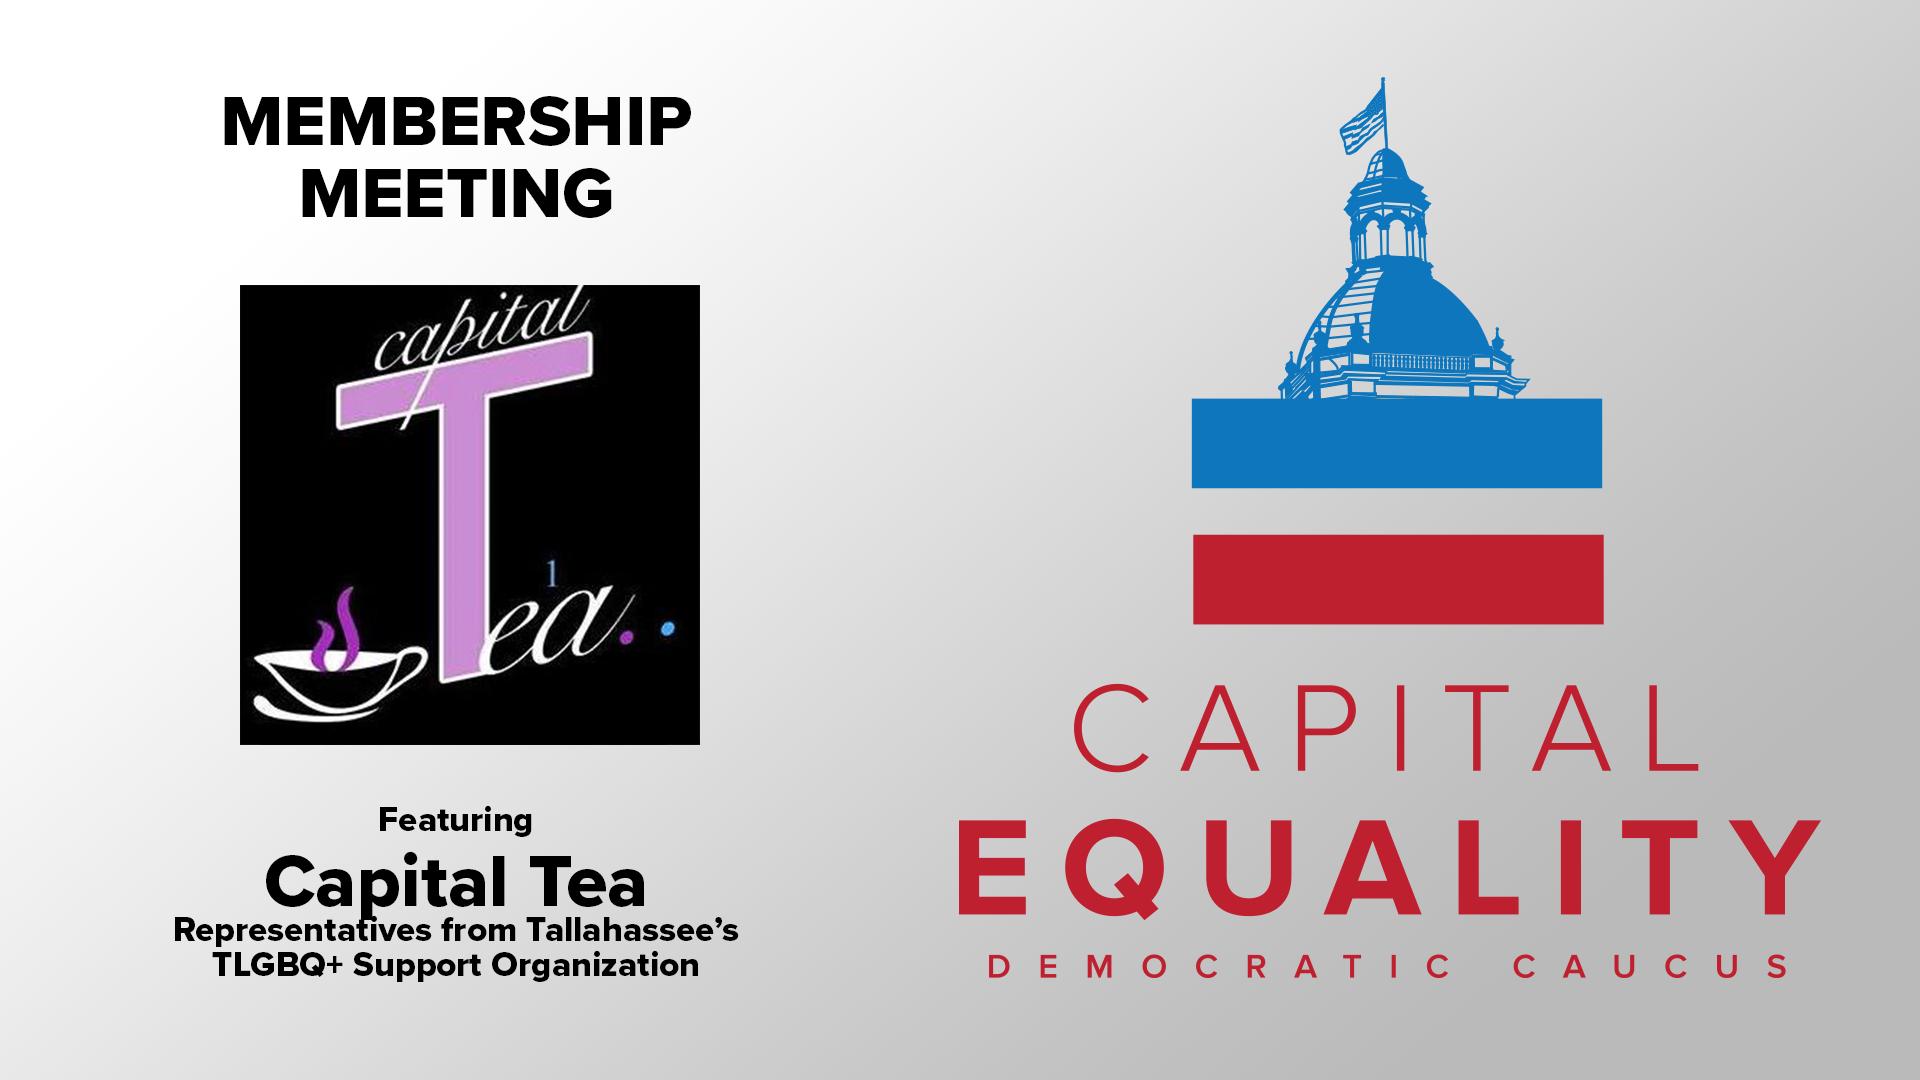 Membership Meeting with Capital Tea Transgender Support Organization